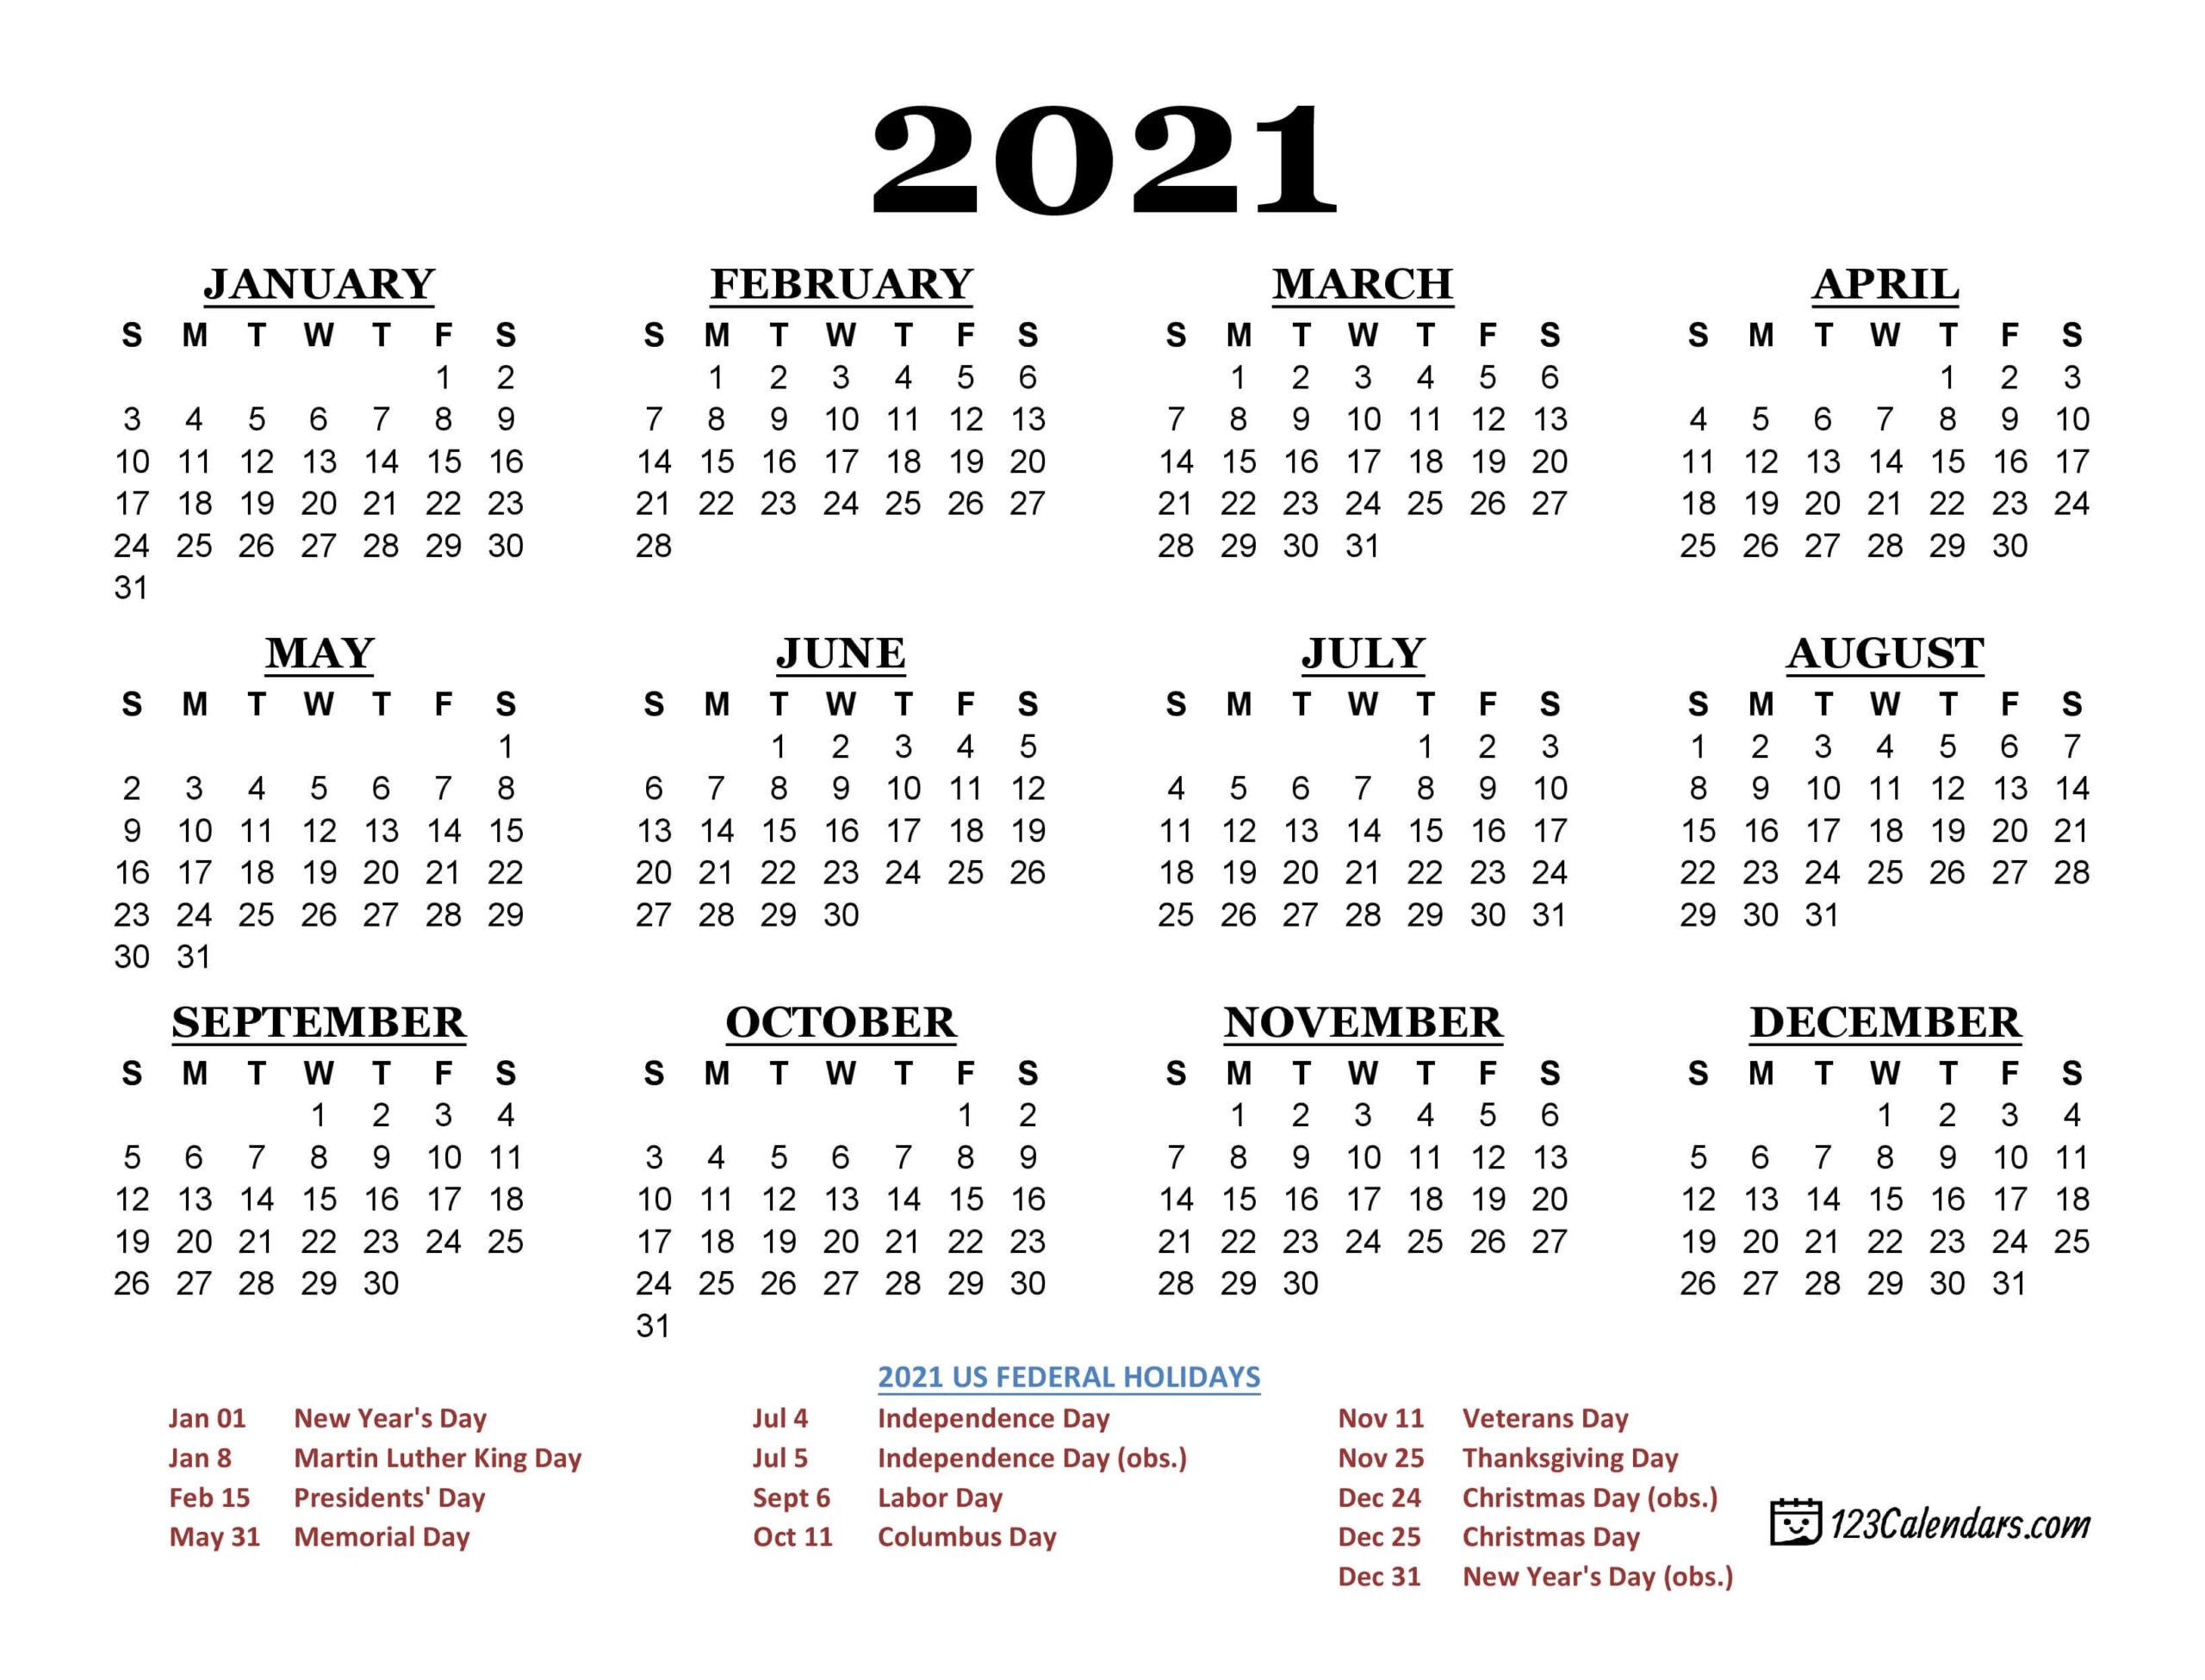 2021 Printable Calendar | 123Calendars in 2021 Printable Pocket Calendars